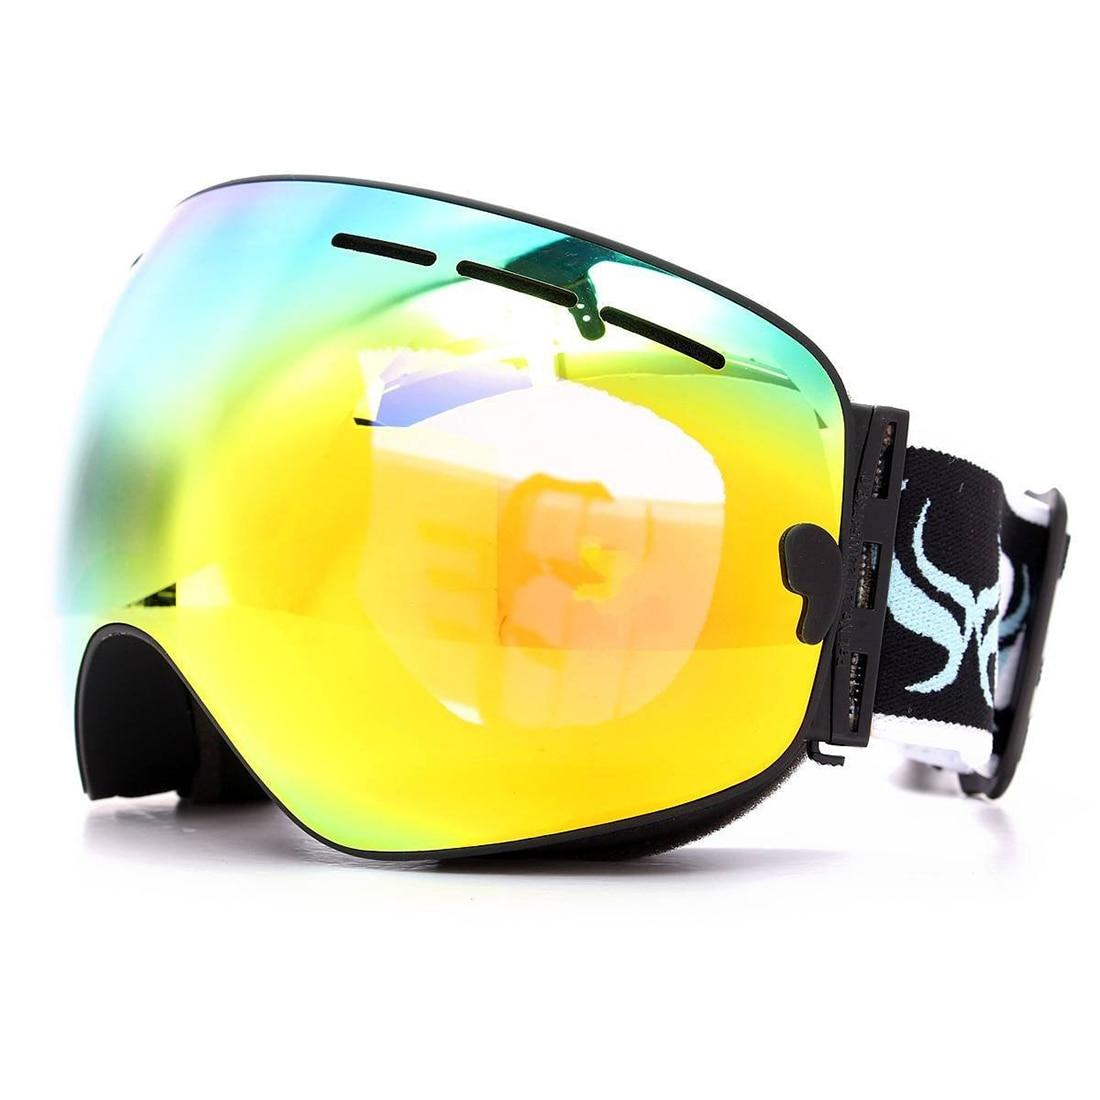 Ski goggles double layer anti-fog eyes black frame